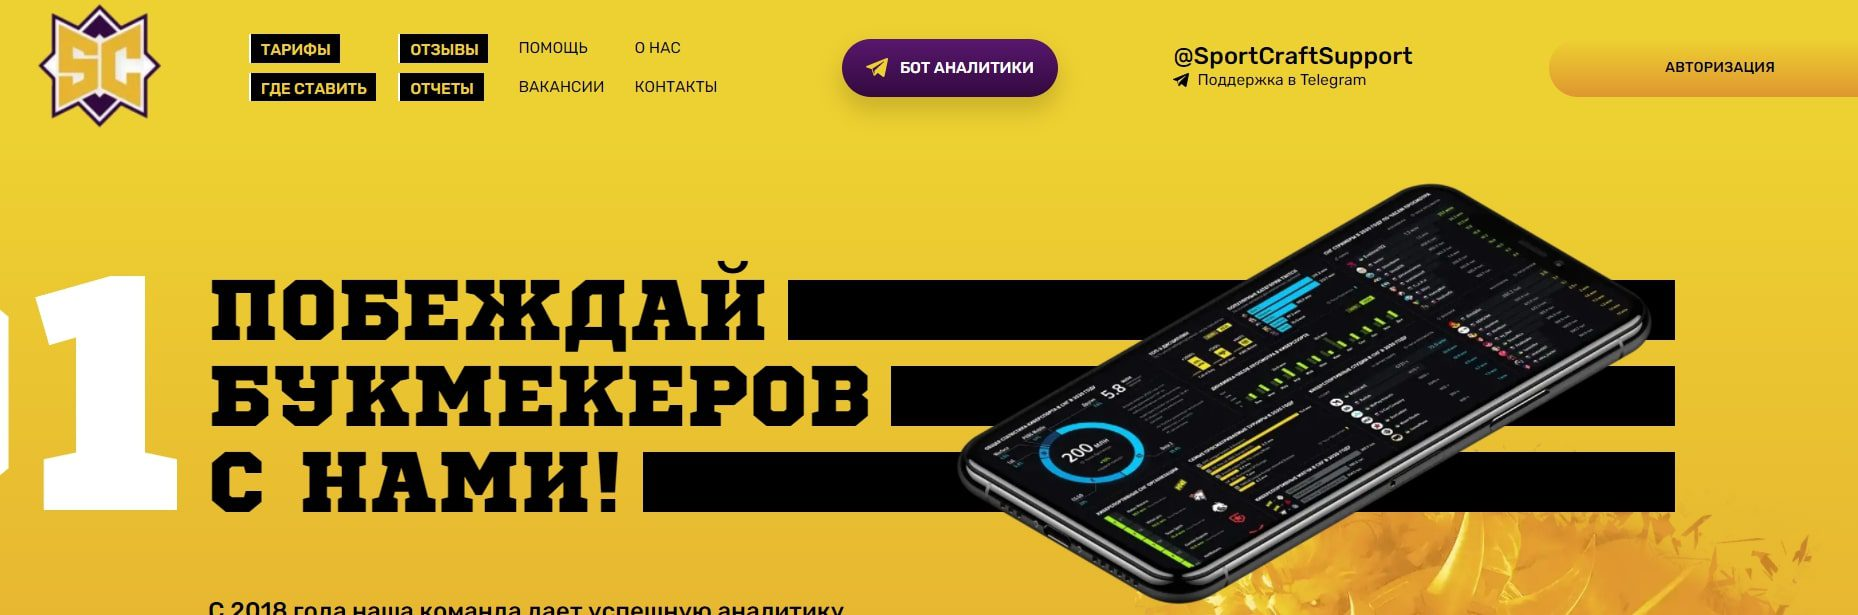 Сайт Sportcraft.club